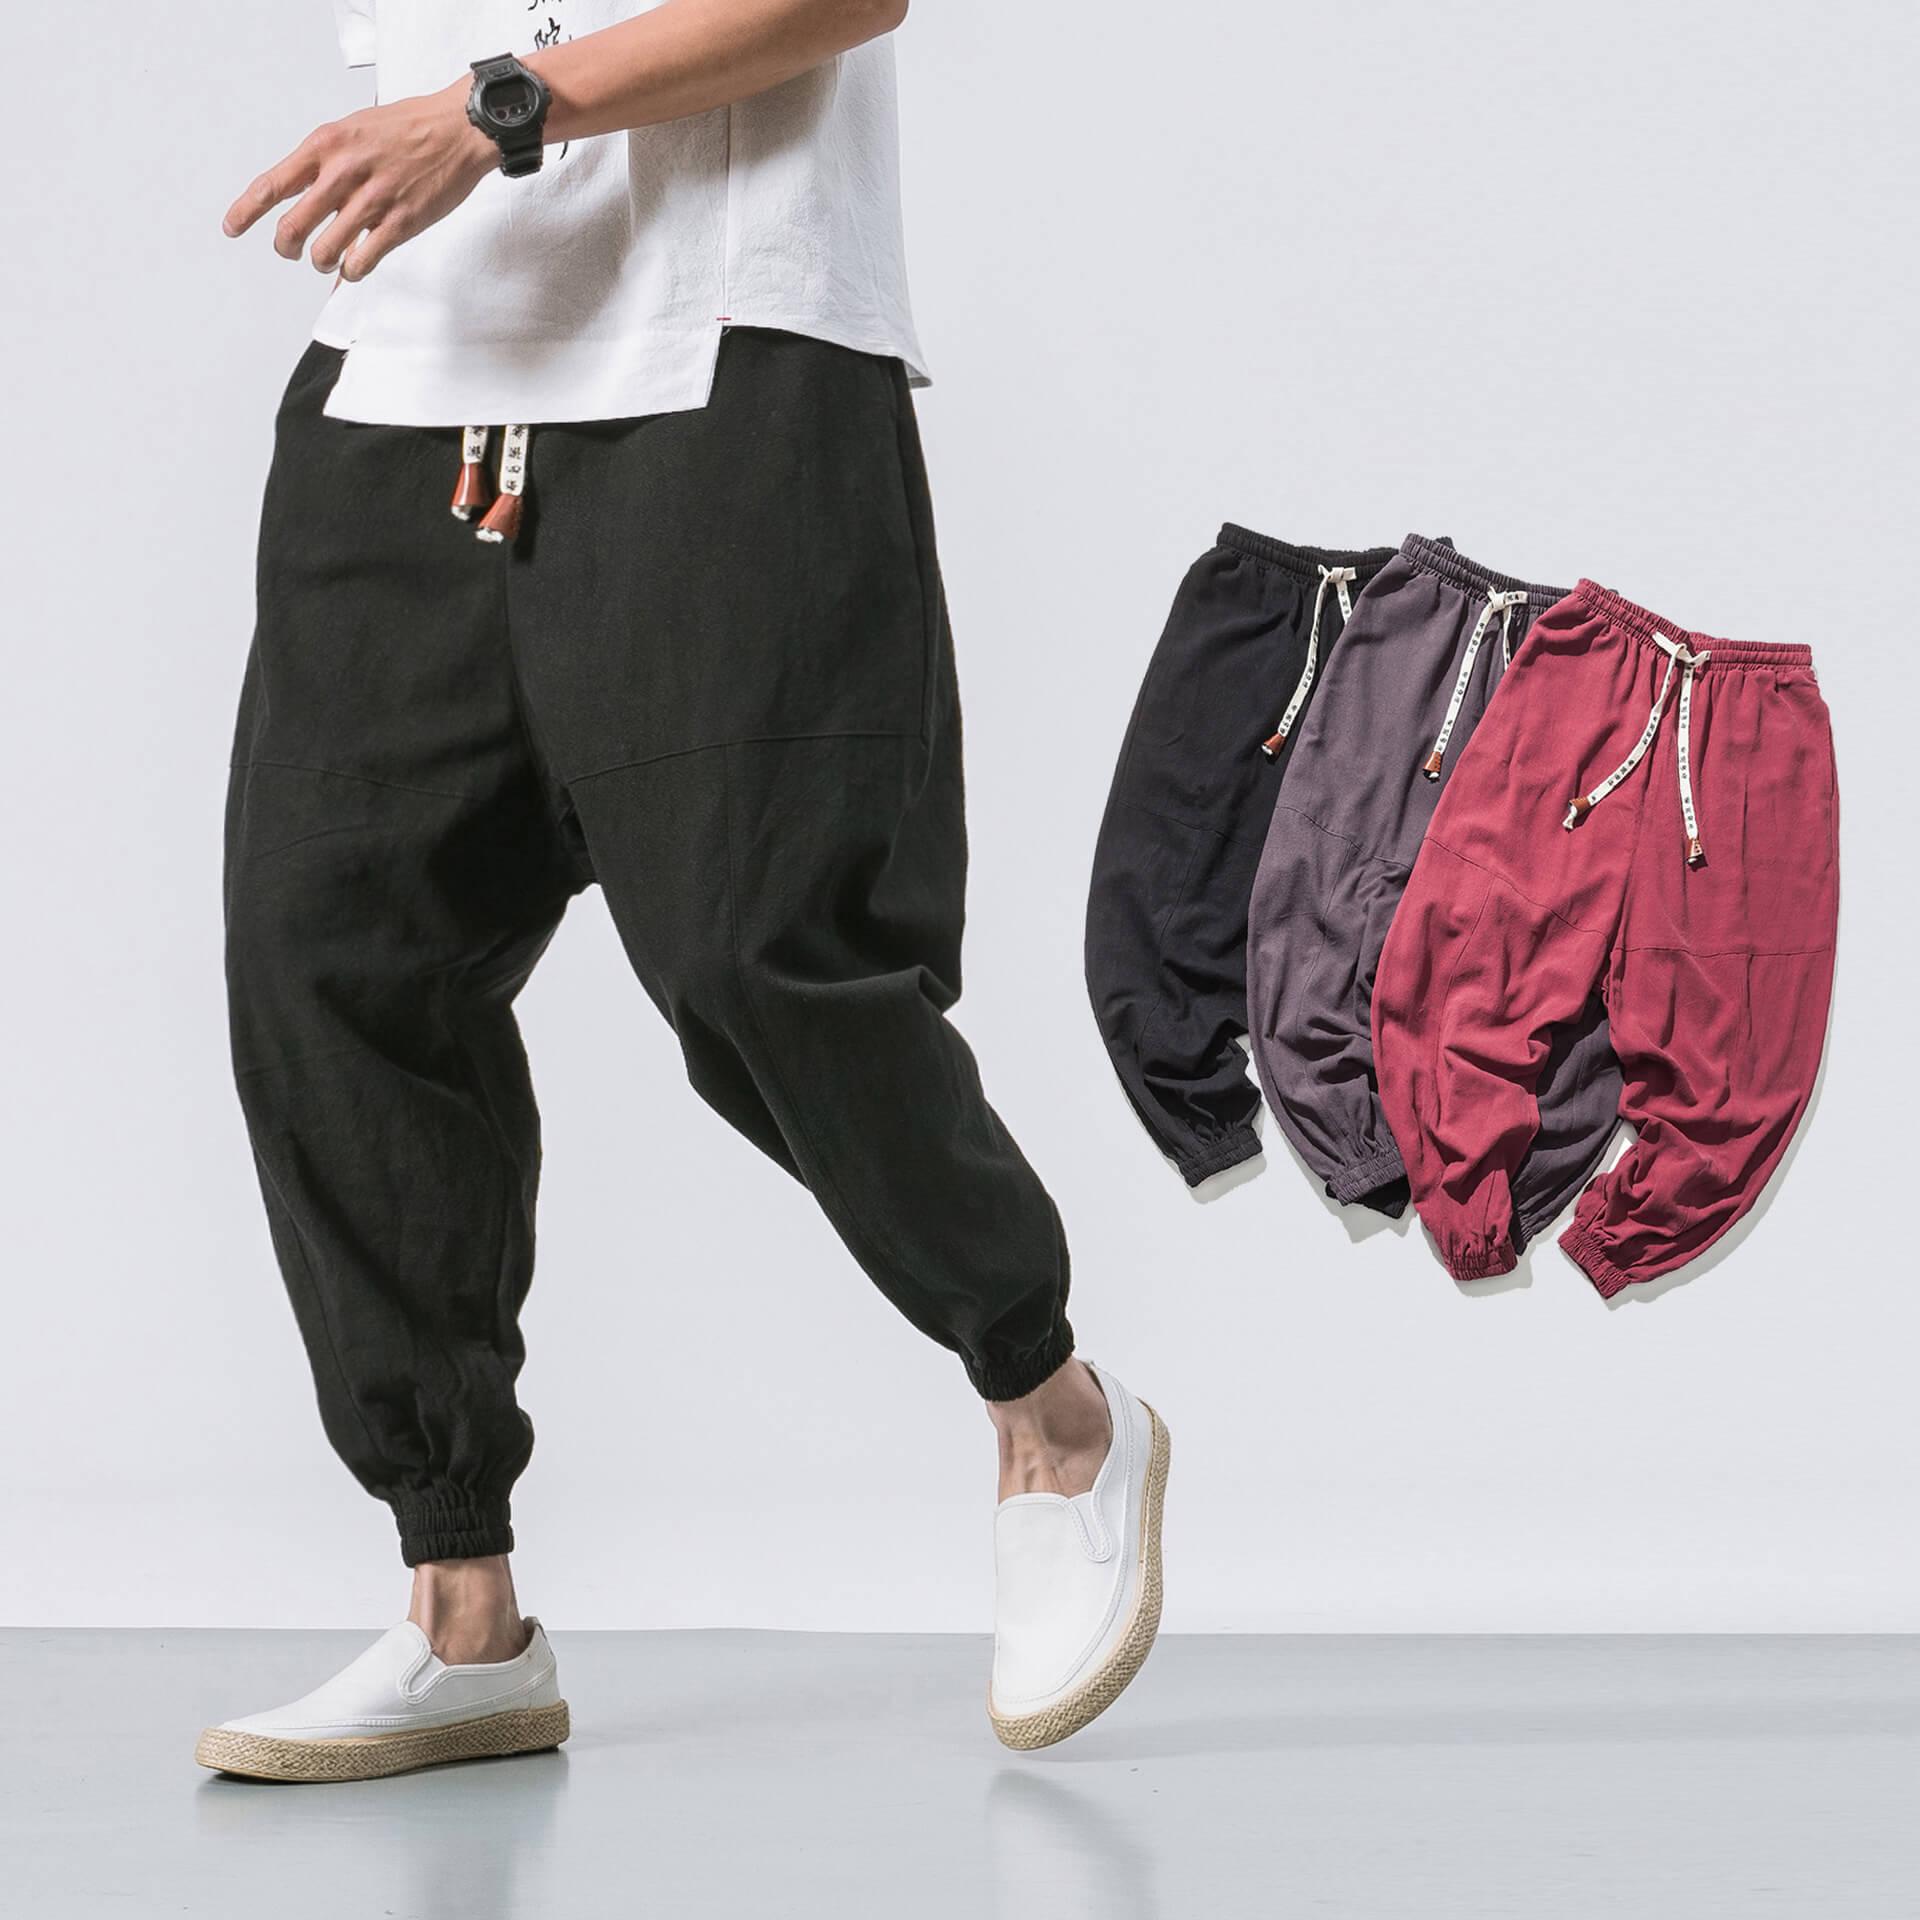 NicheDropshipping_Men Hip Hop Streetwear Pants